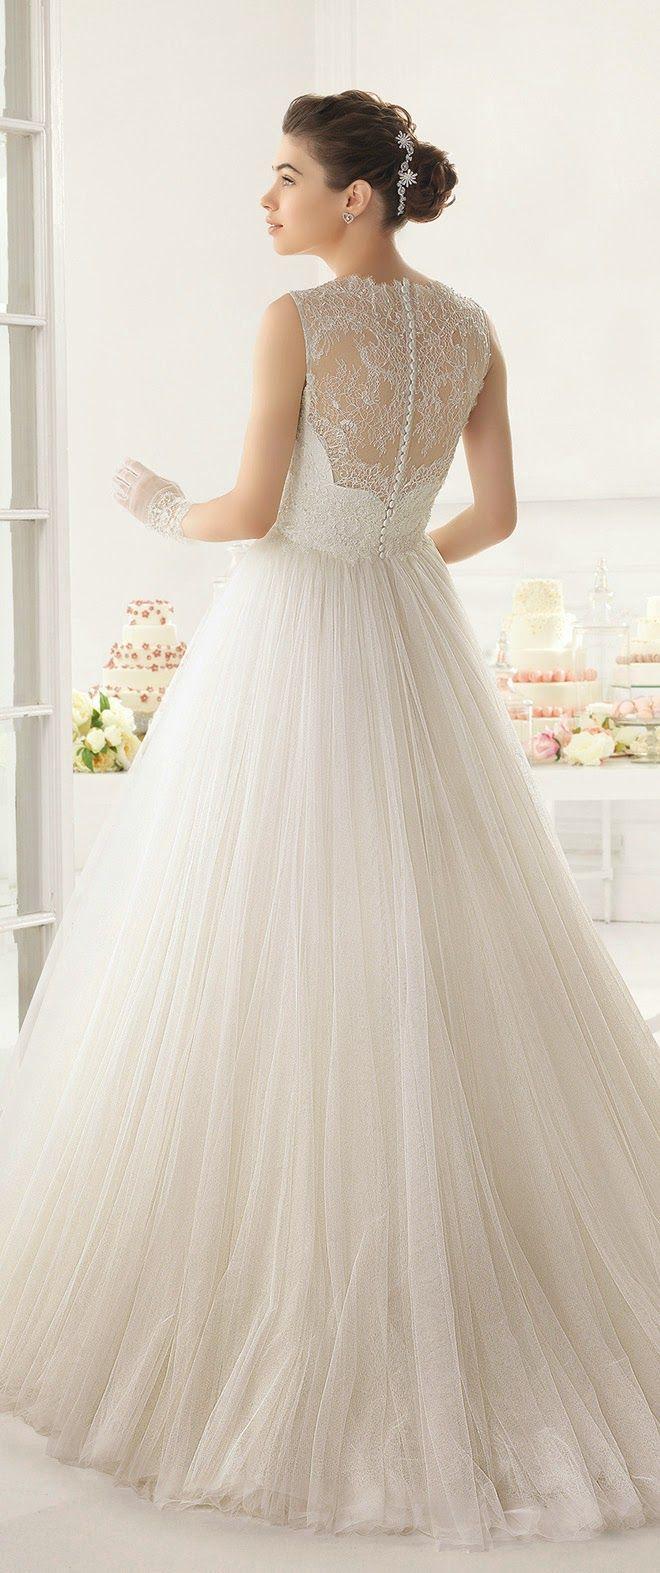 Wedding dresses department stores  airebarcelonaweddingdressesCg   Me